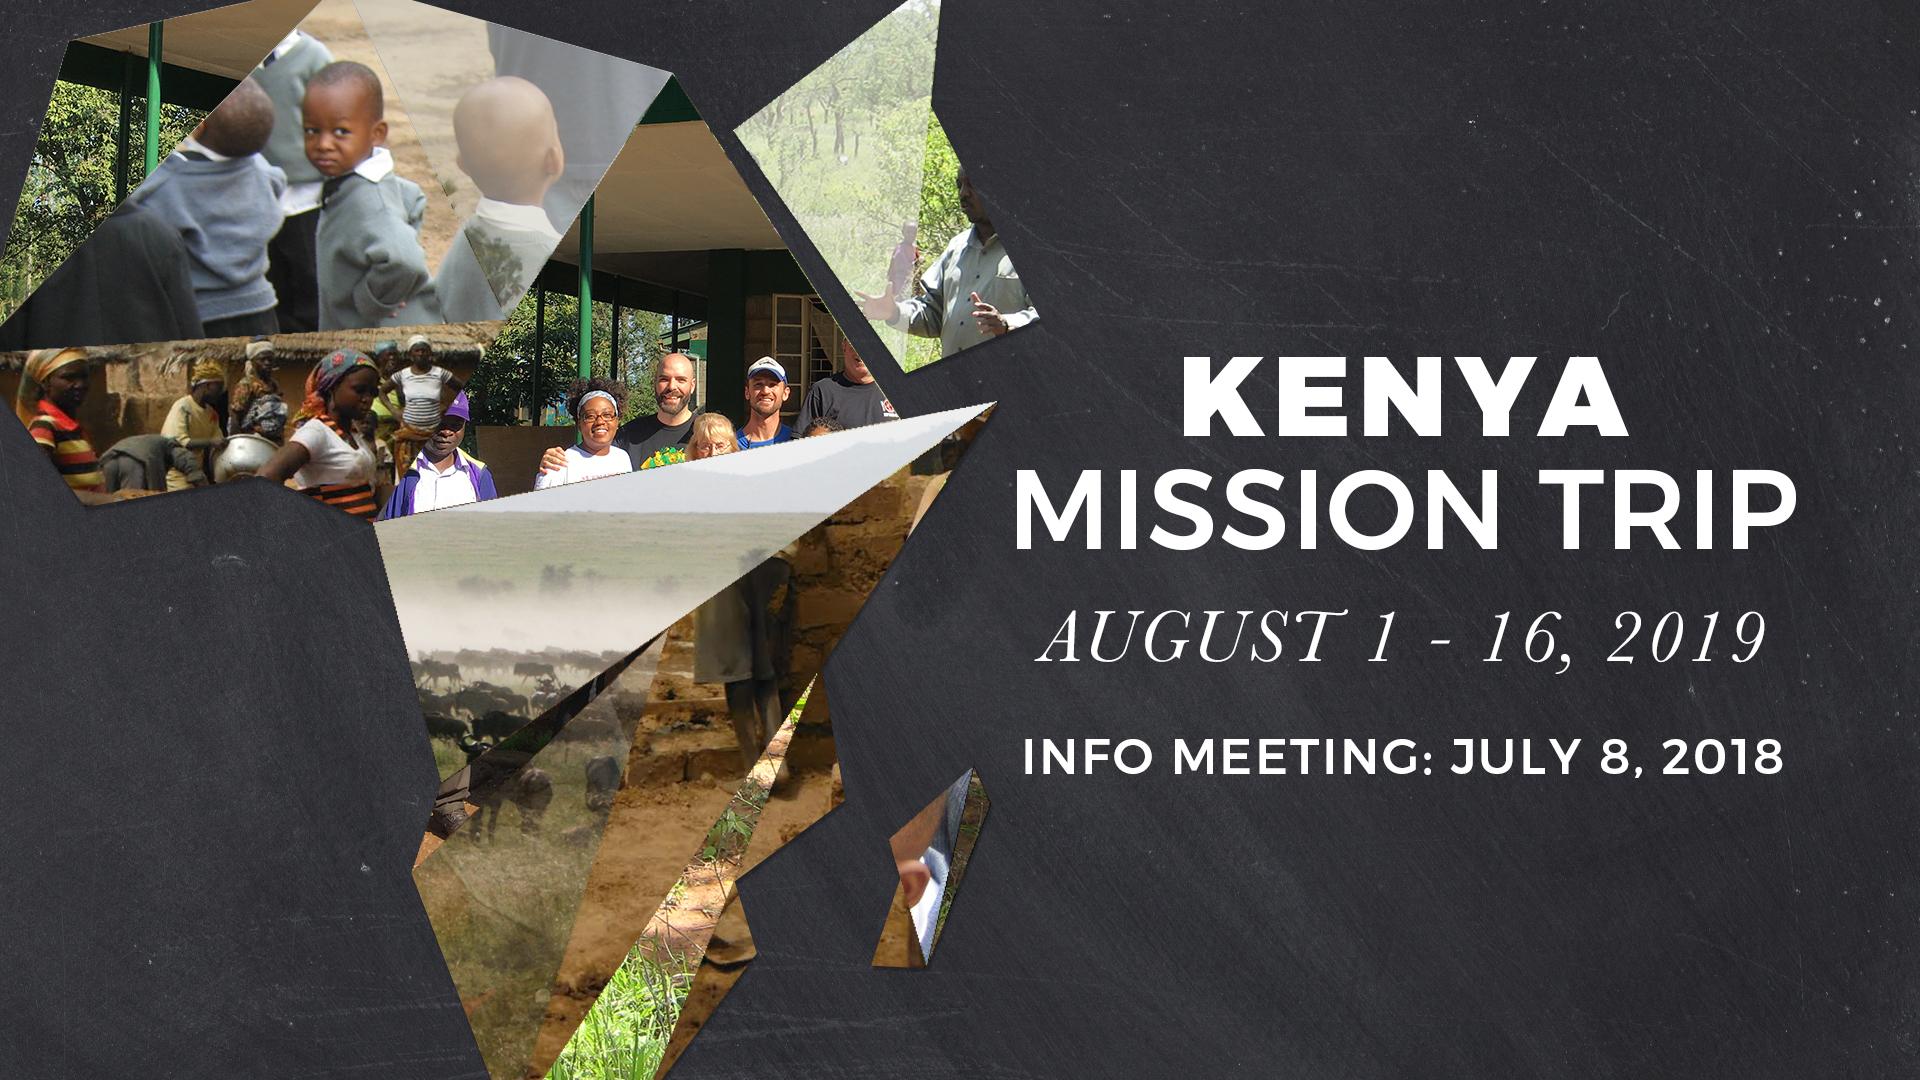 kenya mission trip valley view dallas